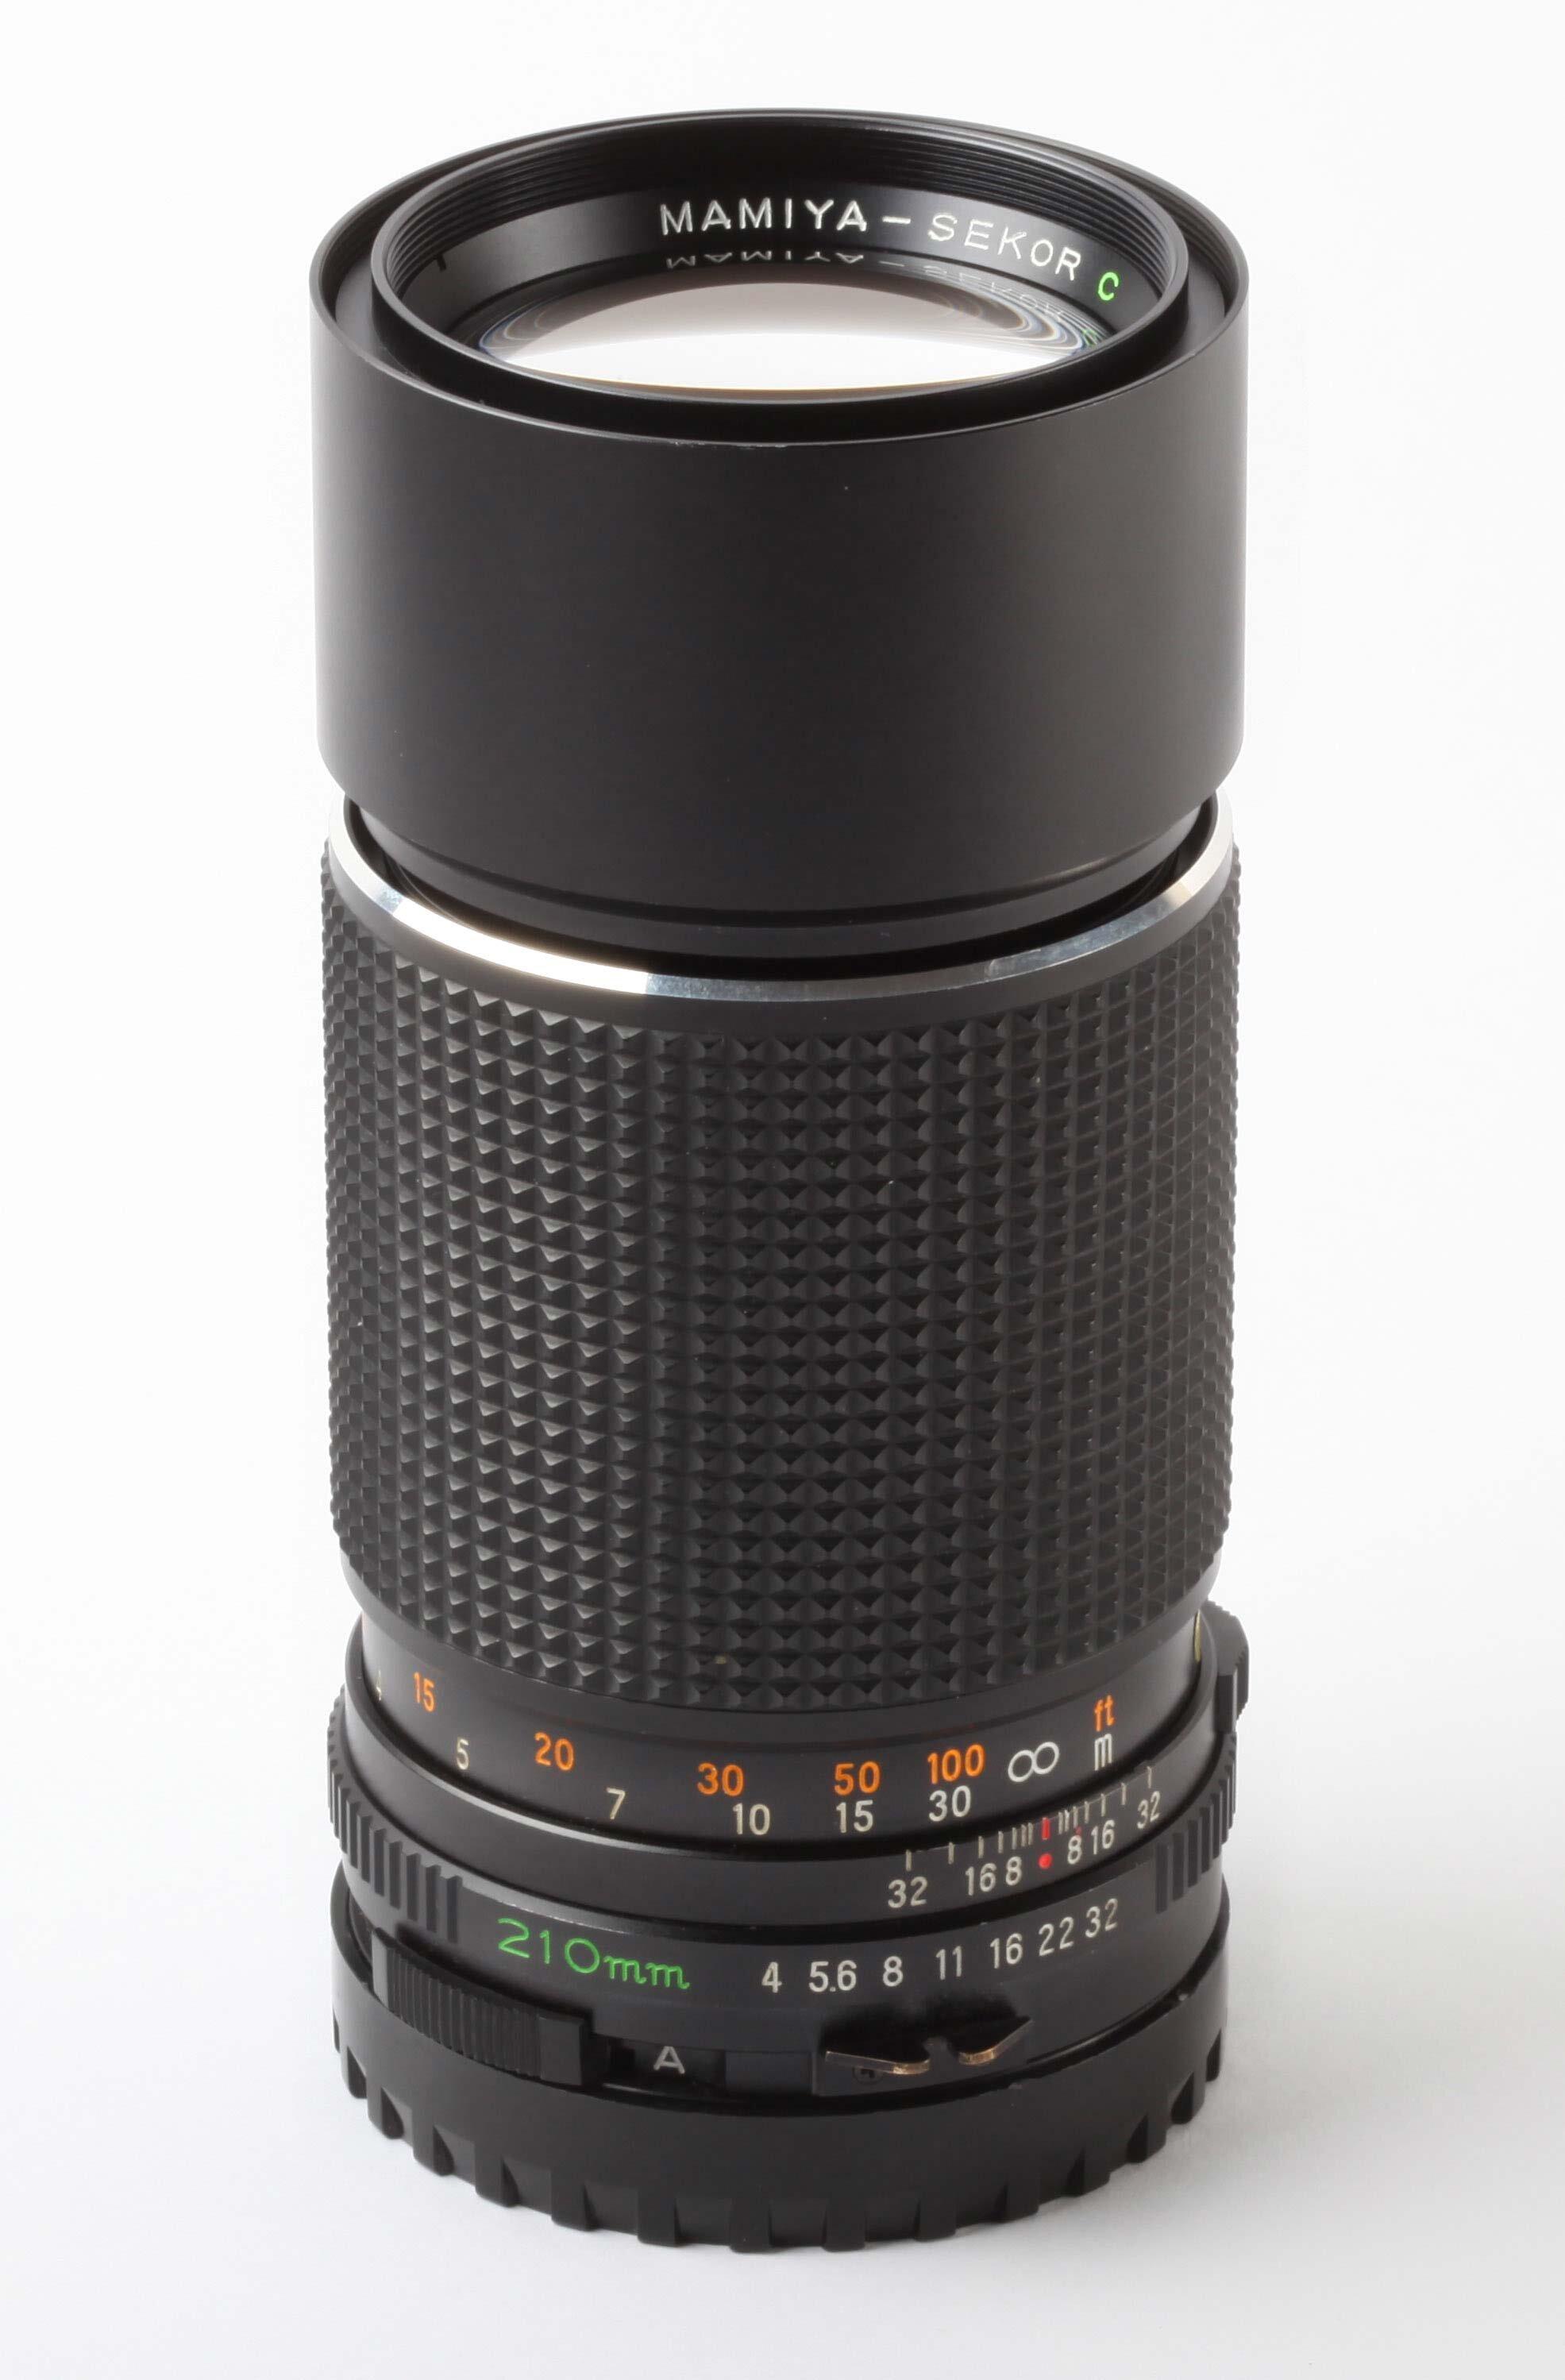 Mamiya-Sekor C 1:4/210mm für Mamiya 645